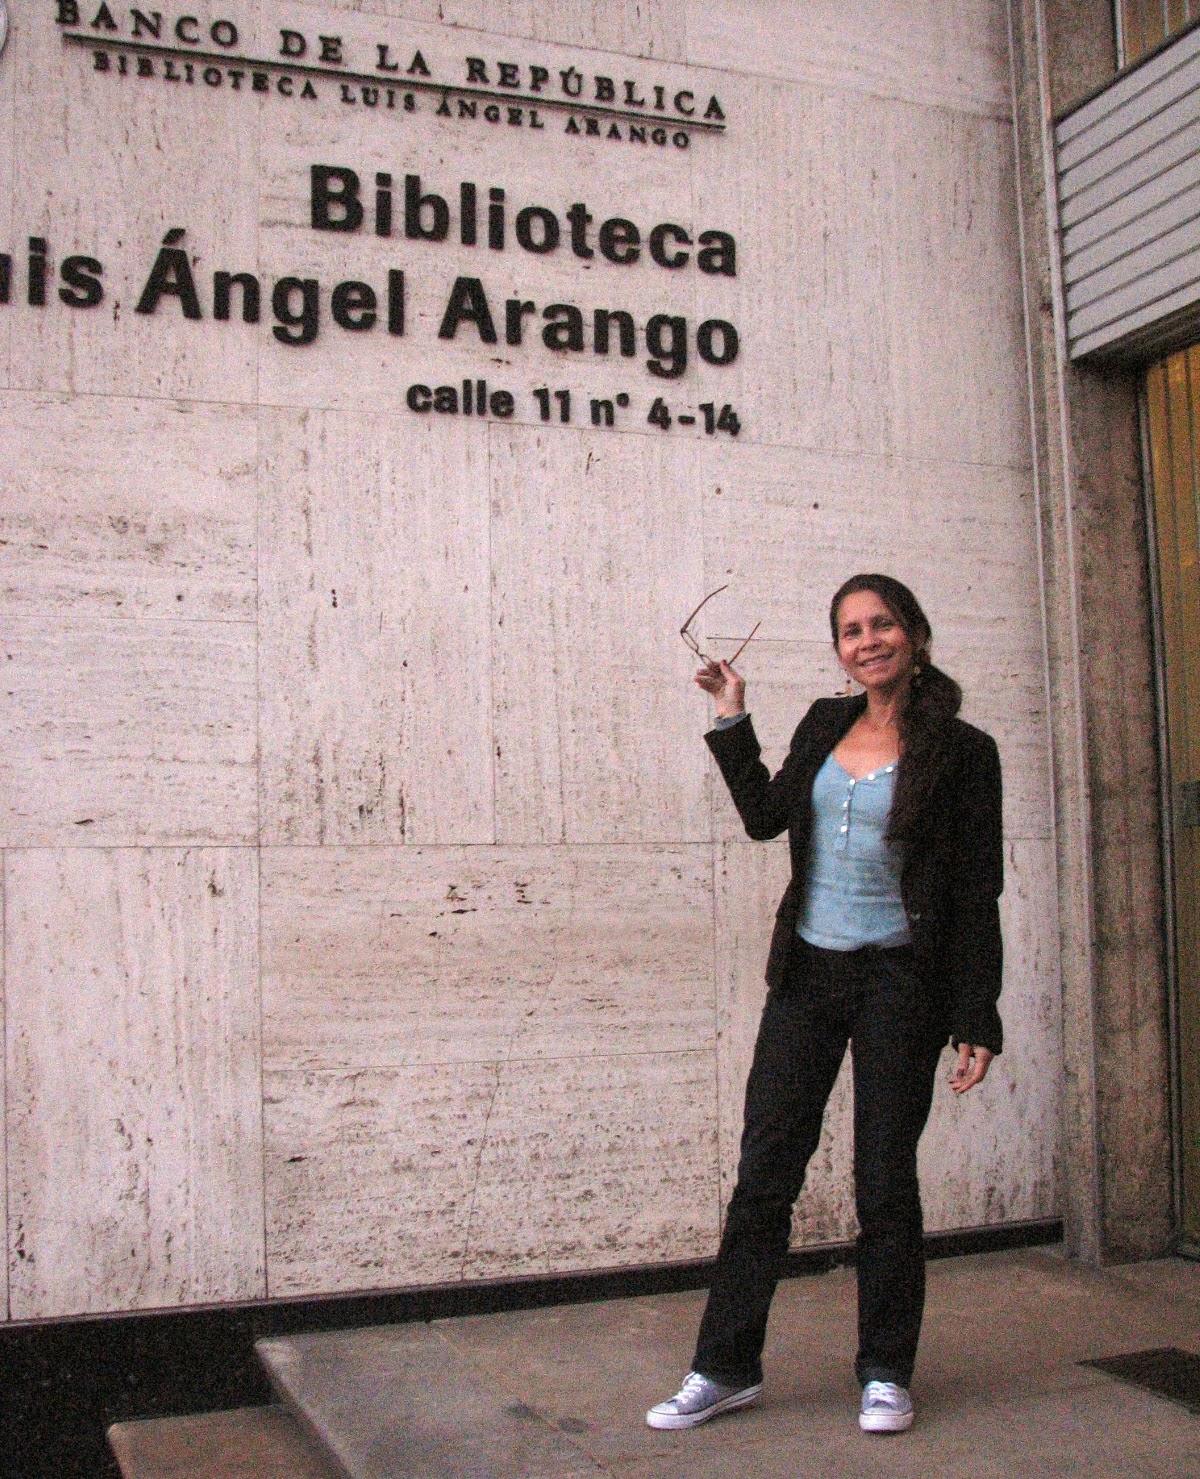 luis angel arango biblioteca: